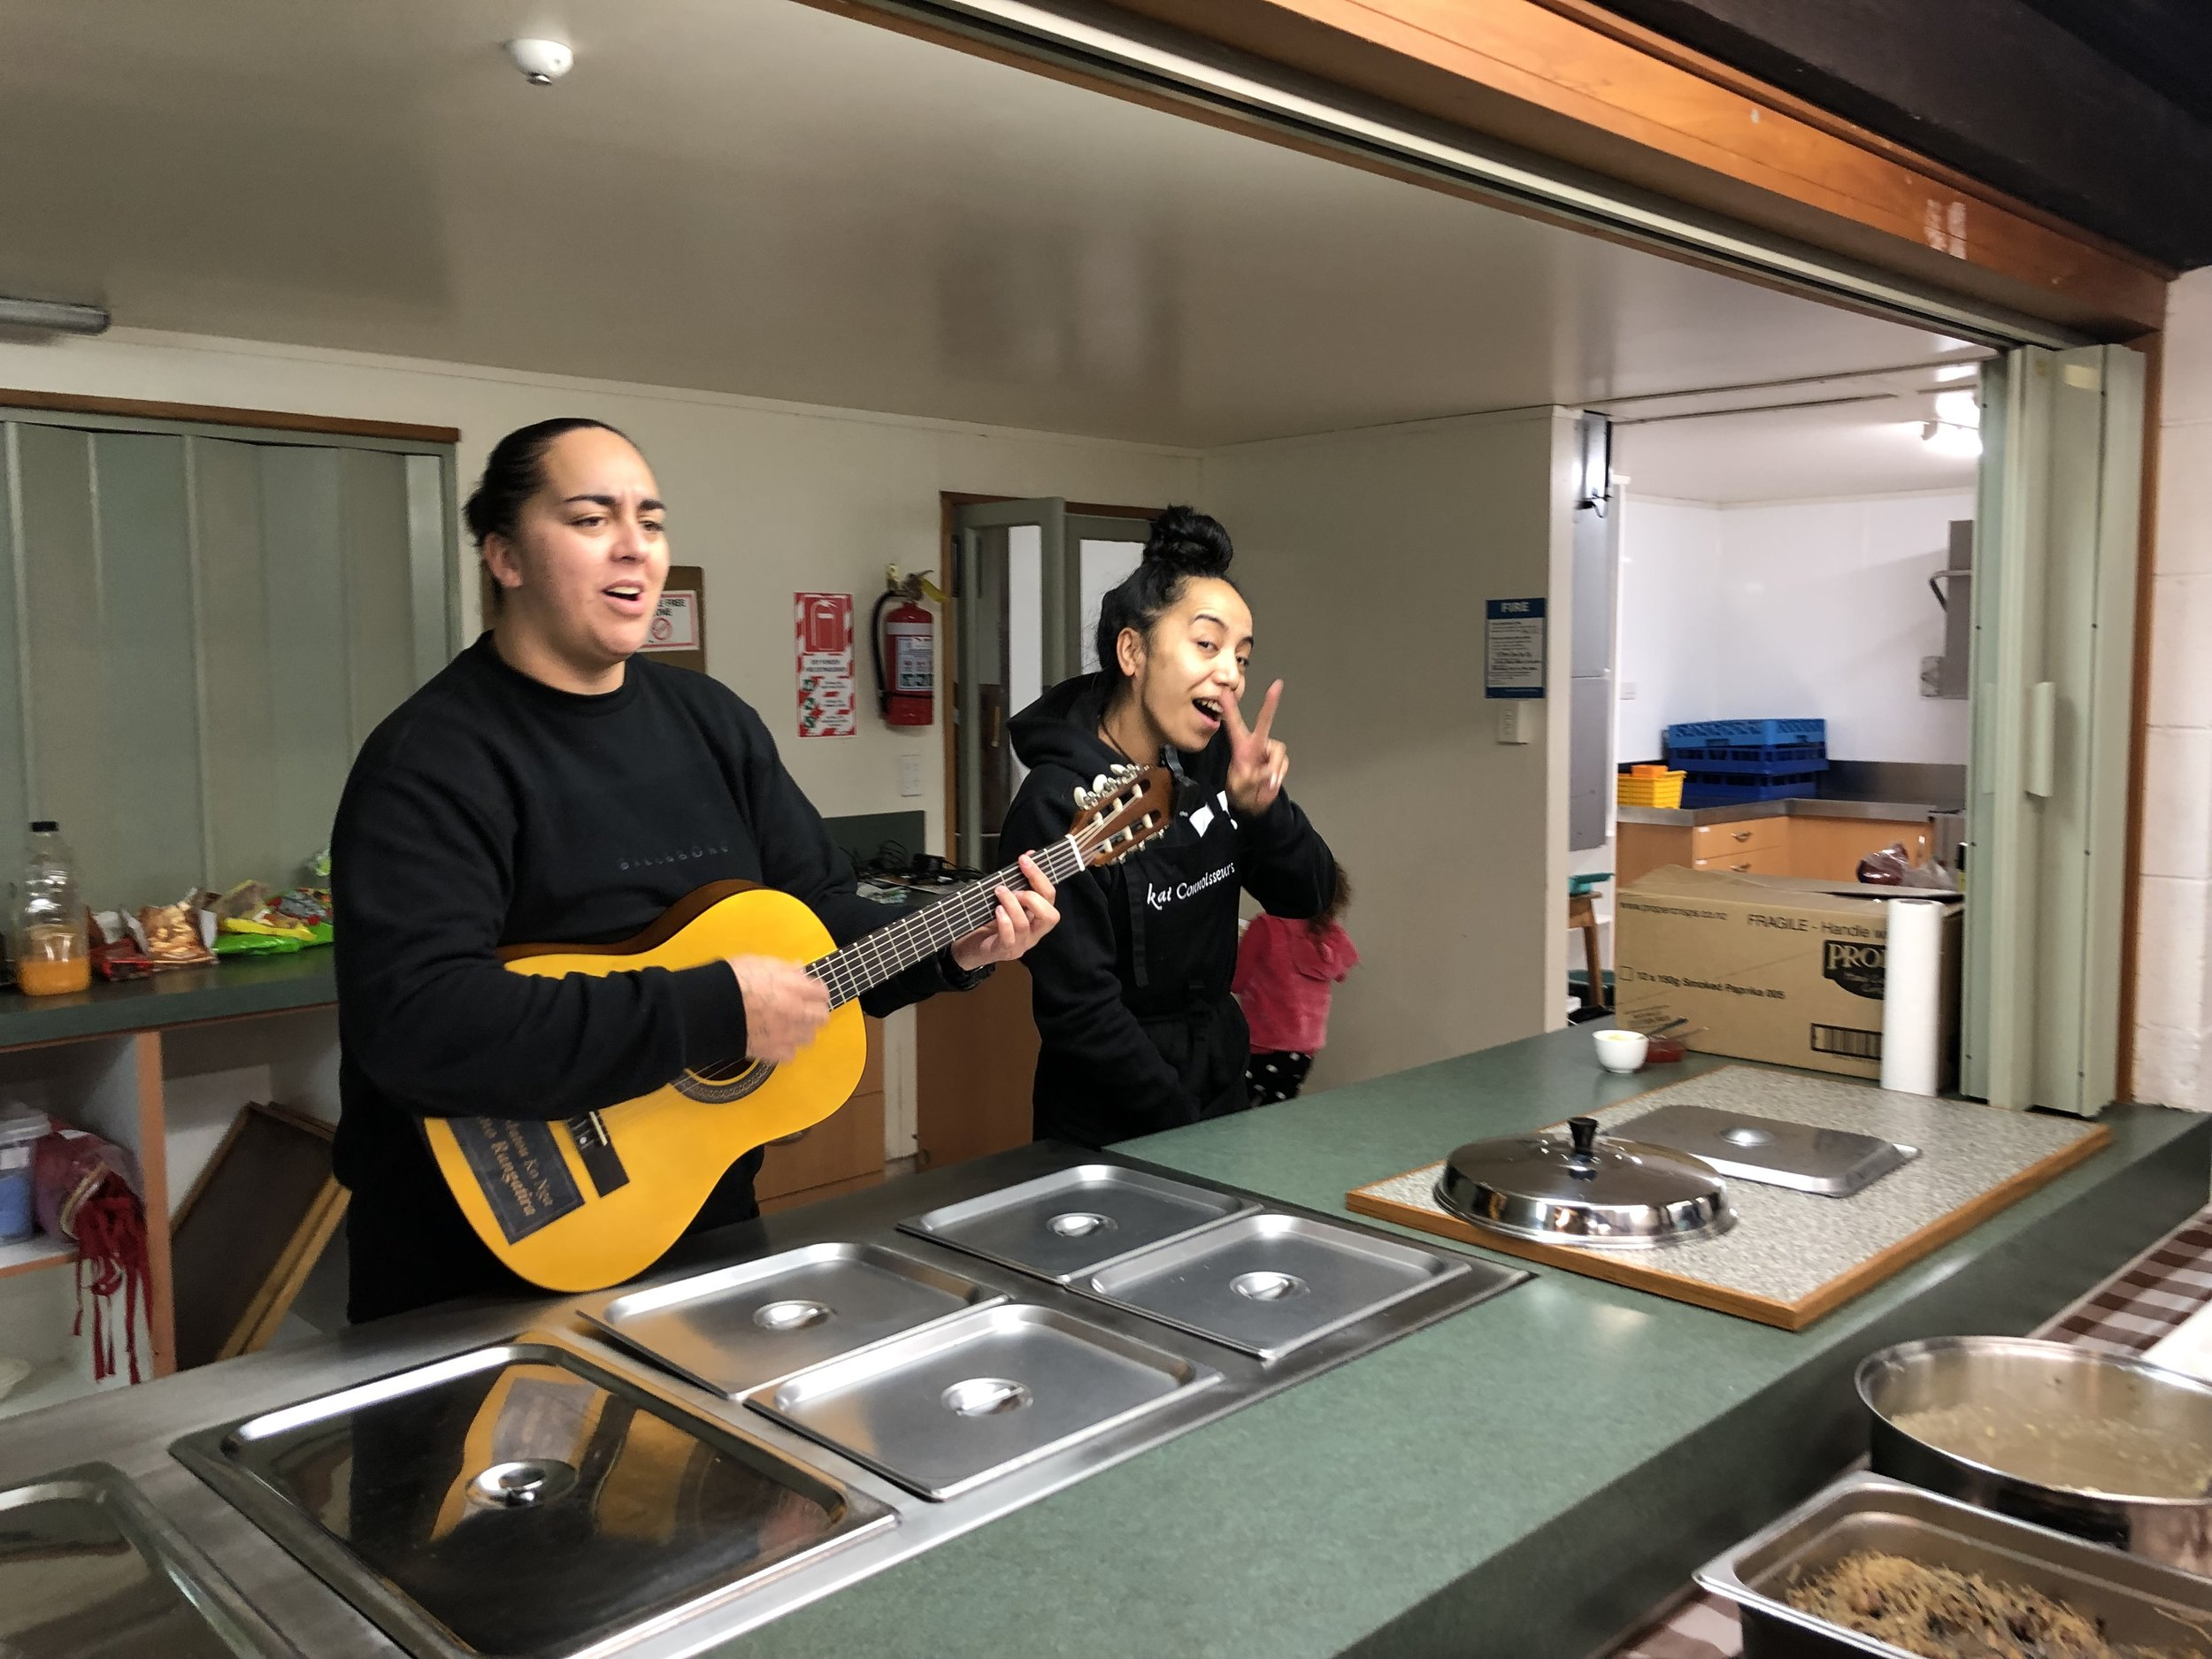 Ngāti Wheke in the Whare